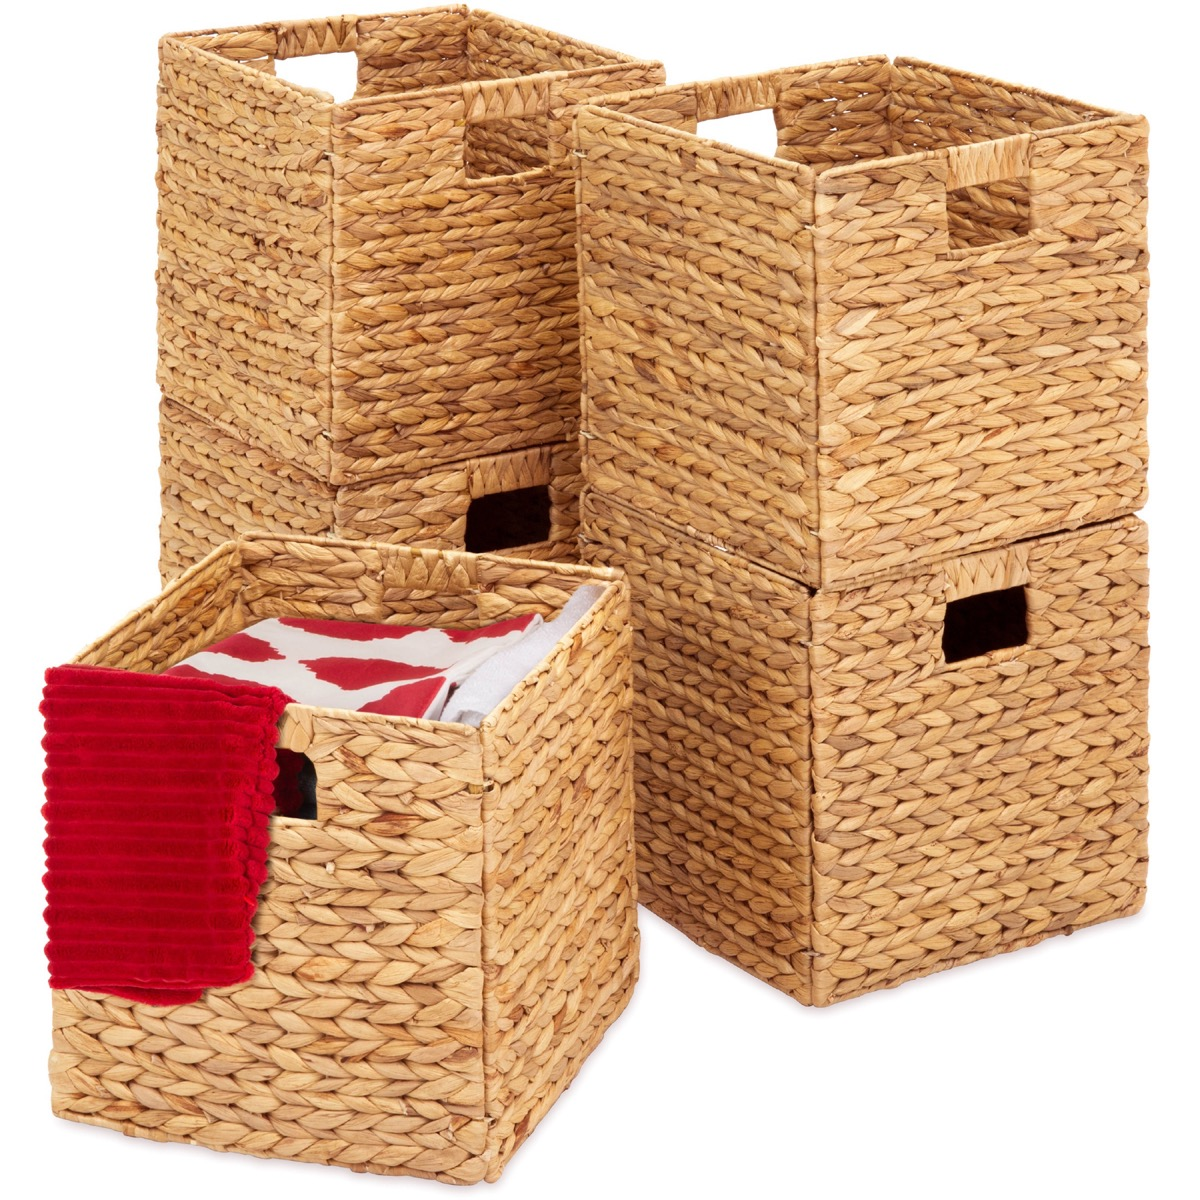 Natural fiber storage cubes